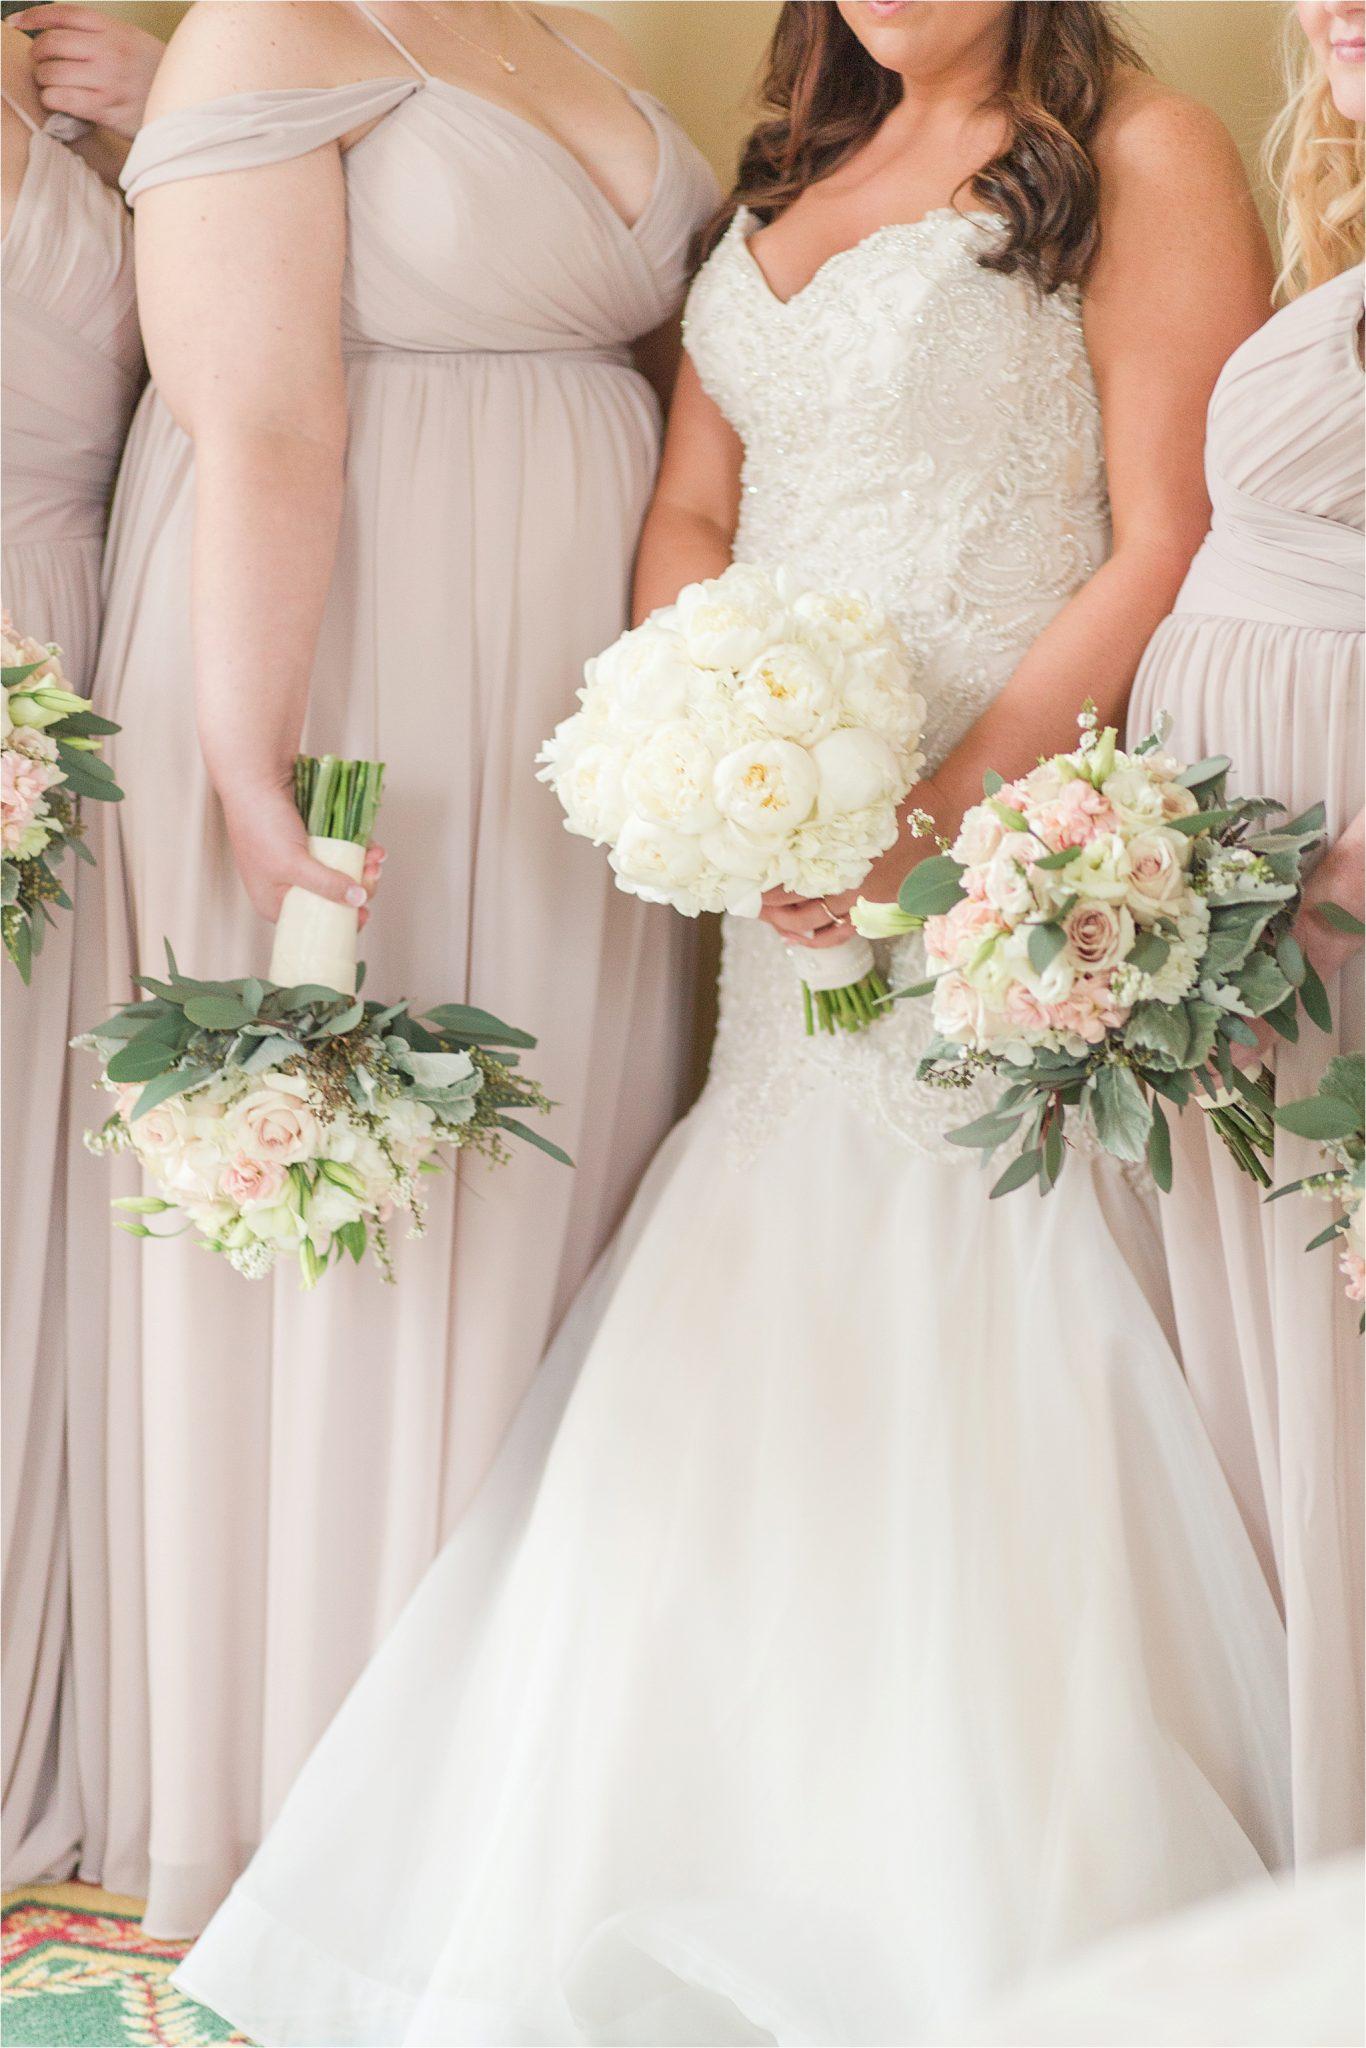 stunning lighting-bridal portraits-mermaid wedding dress-ezell house historic downtown-alabama wedding photographer-blush bridesmaid dresses-soft blushes-mermaid wedding dress-strapless bridal dress